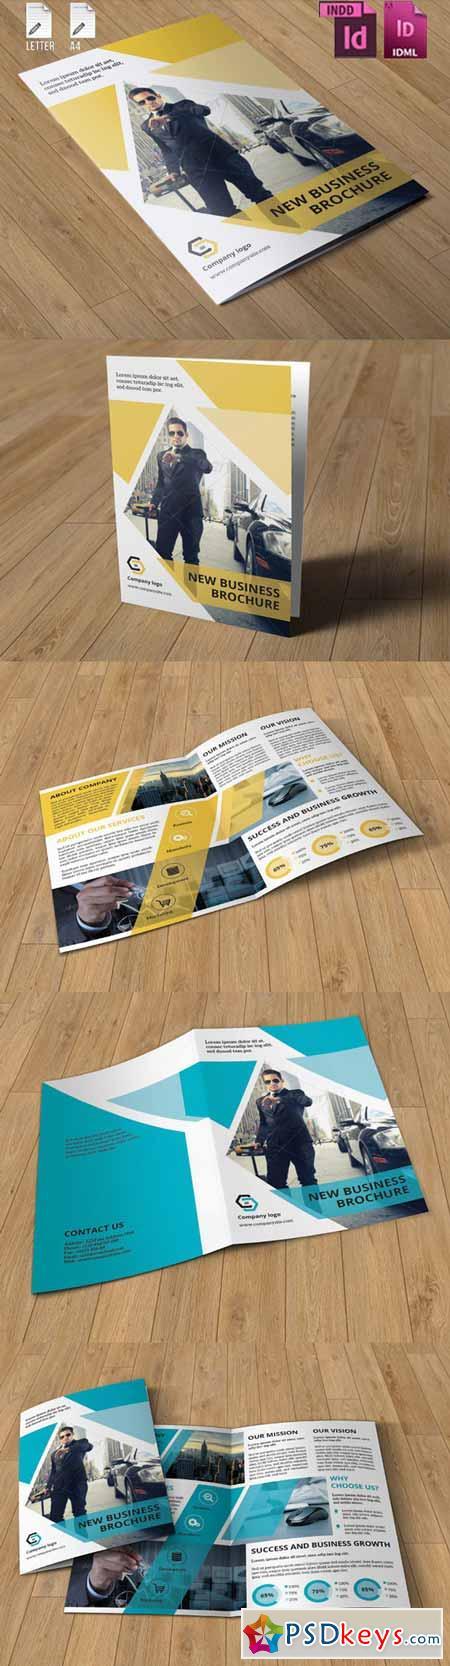 Indesign Corporate Brochure 215079 187 Free Download